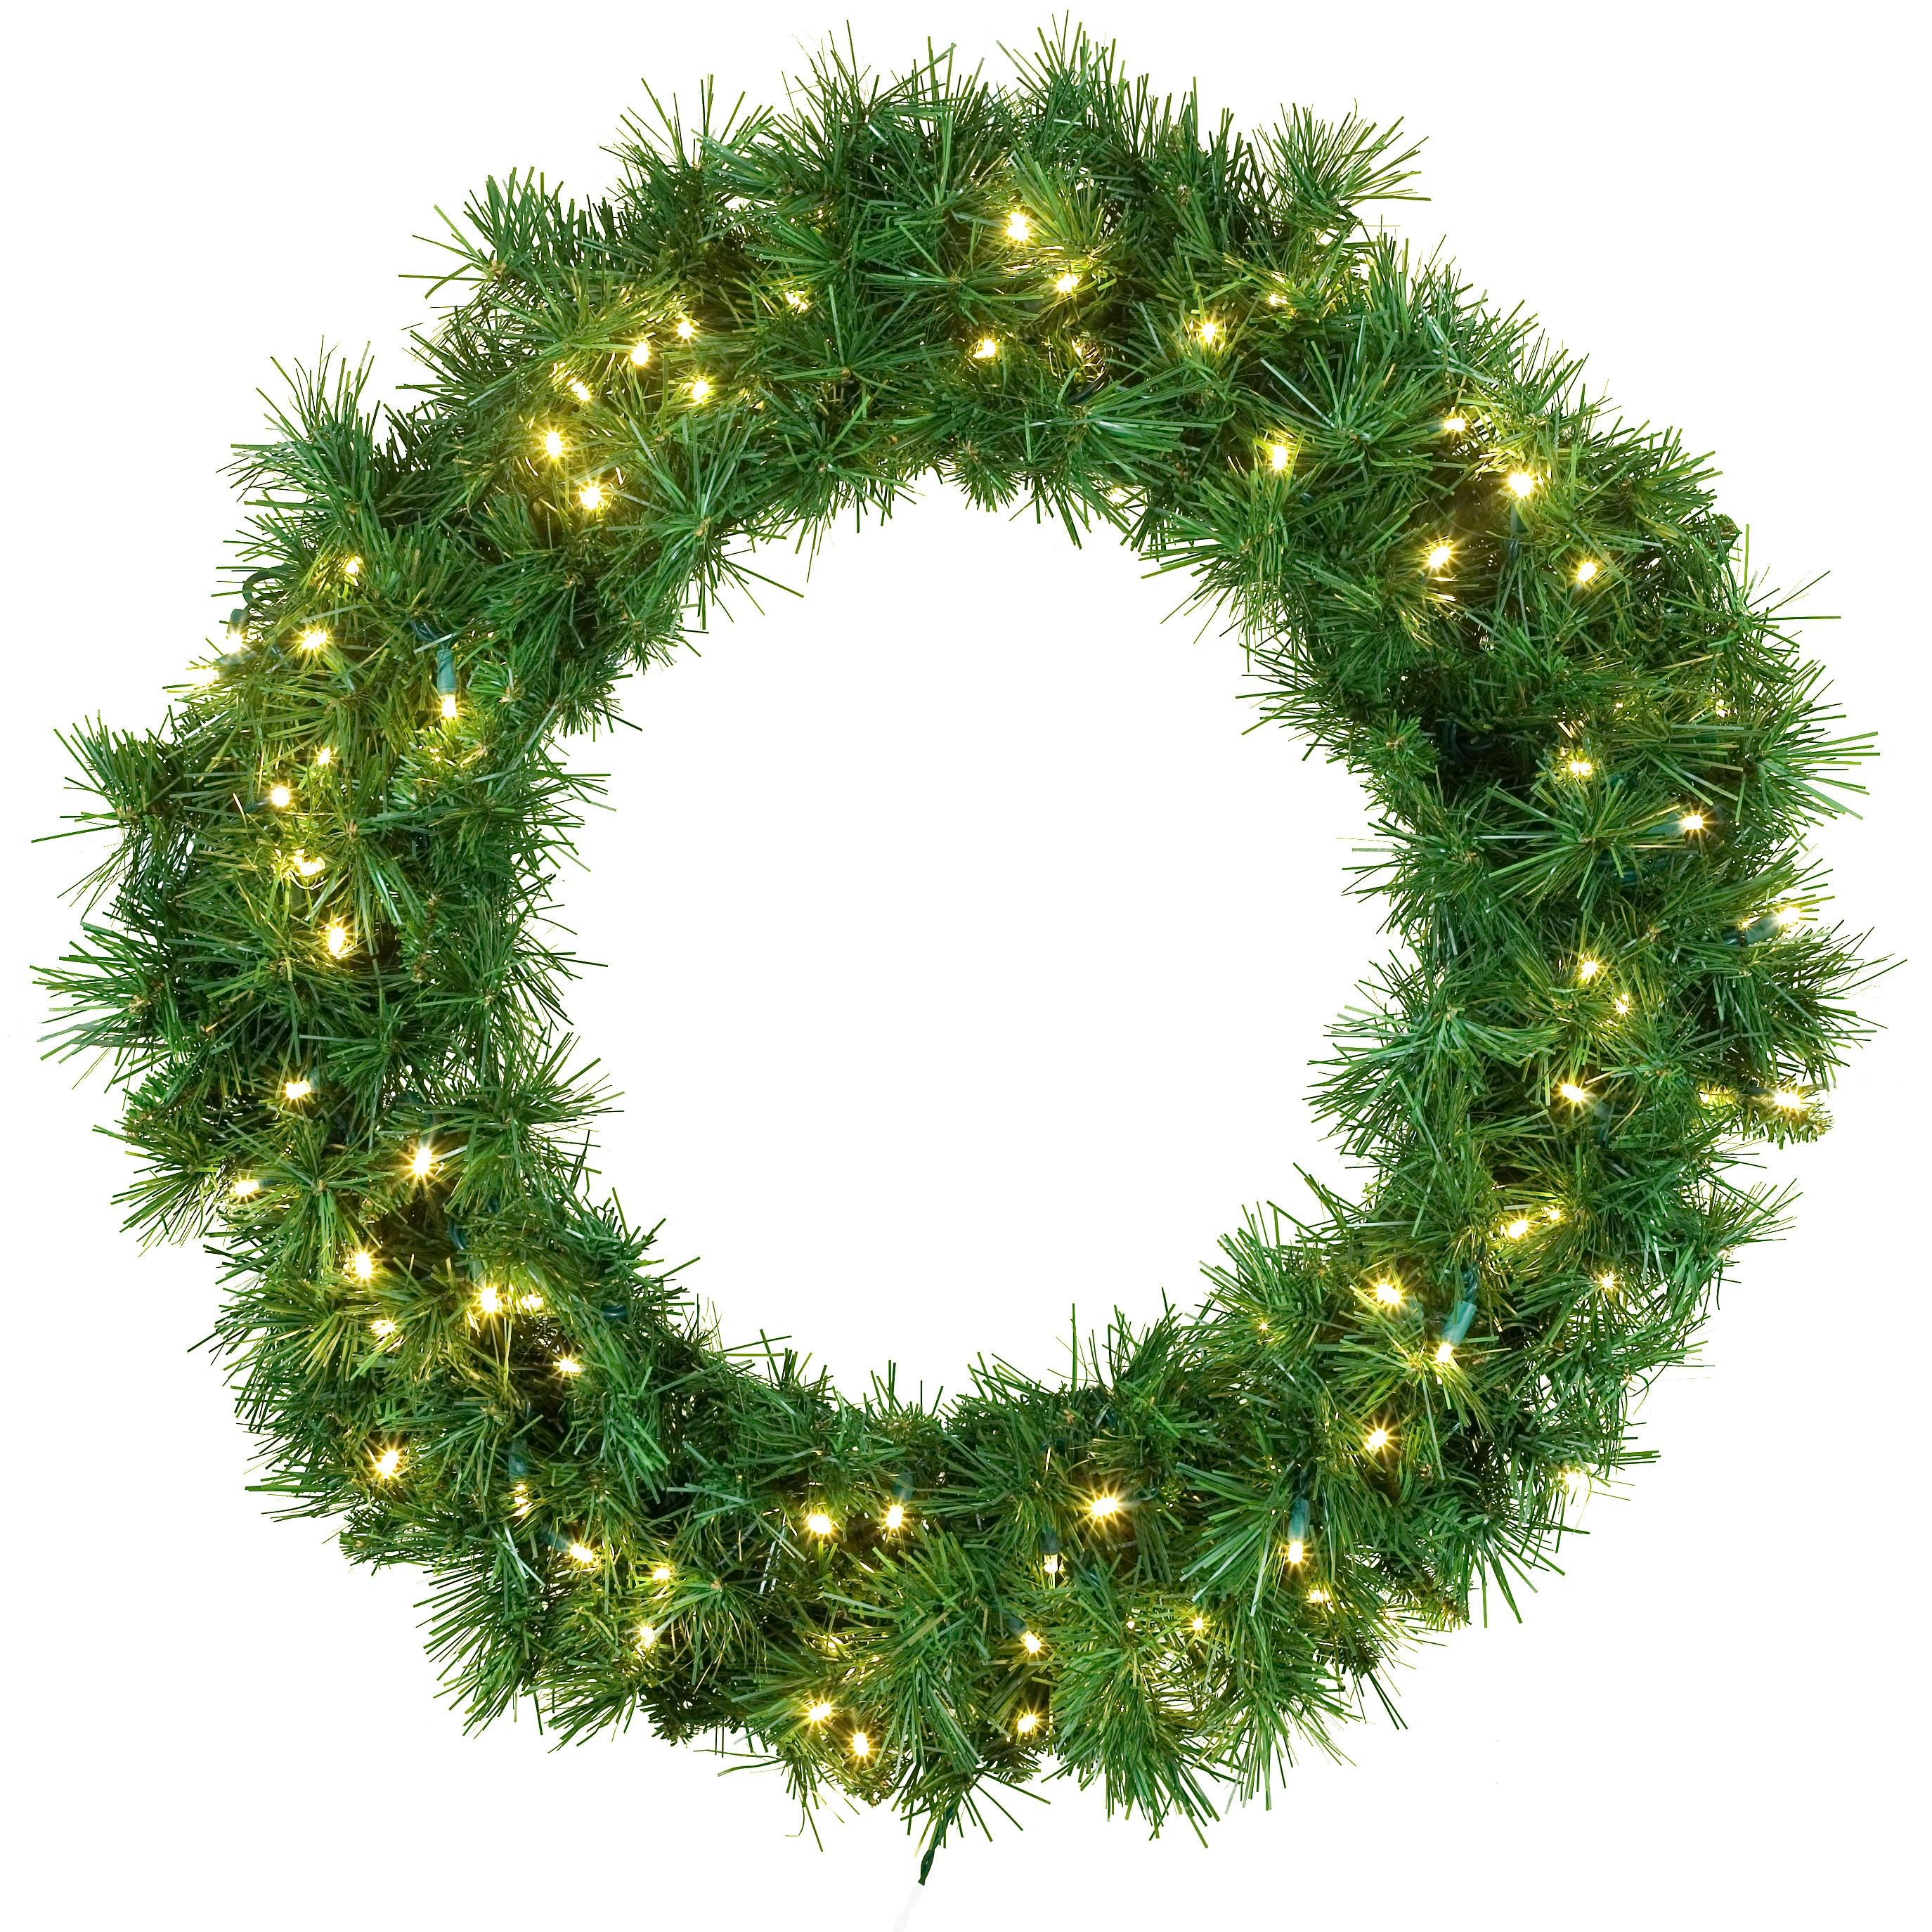 Artificial Christmas Wreaths - Dunhill Fir Prelit LED ...